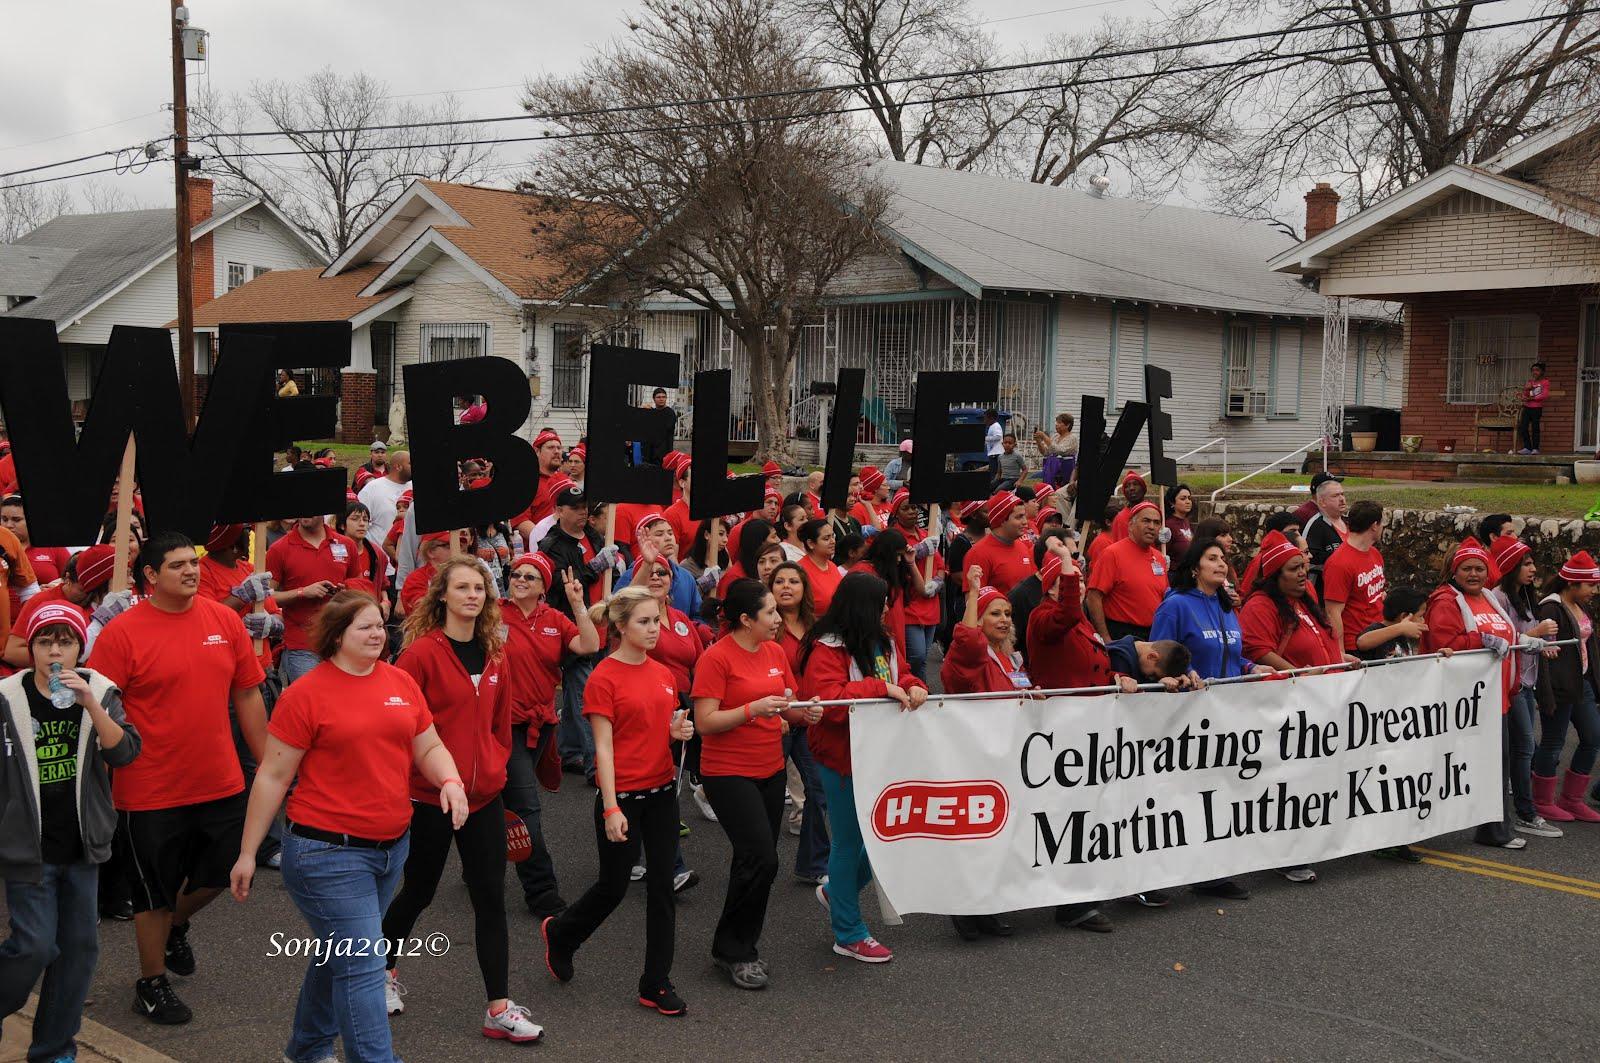 Martin Luther King Iii Addresses 100 000 Mlk Jr Marchers San